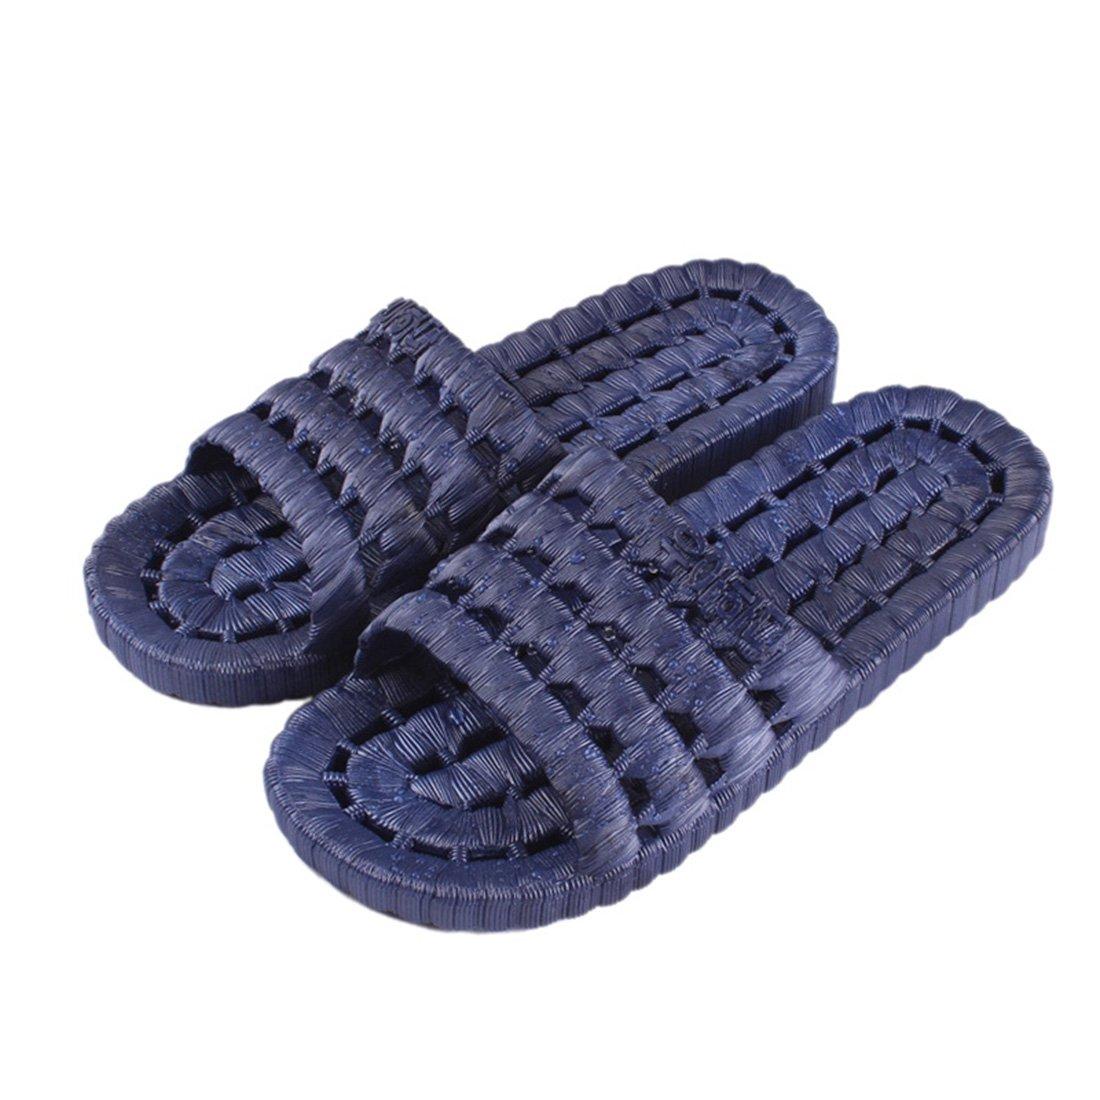 Enerhu Men Anti Slip Shower Shoes Bathroom Slippers Home Sandal Indoor Quick Drying Poolside Beachside